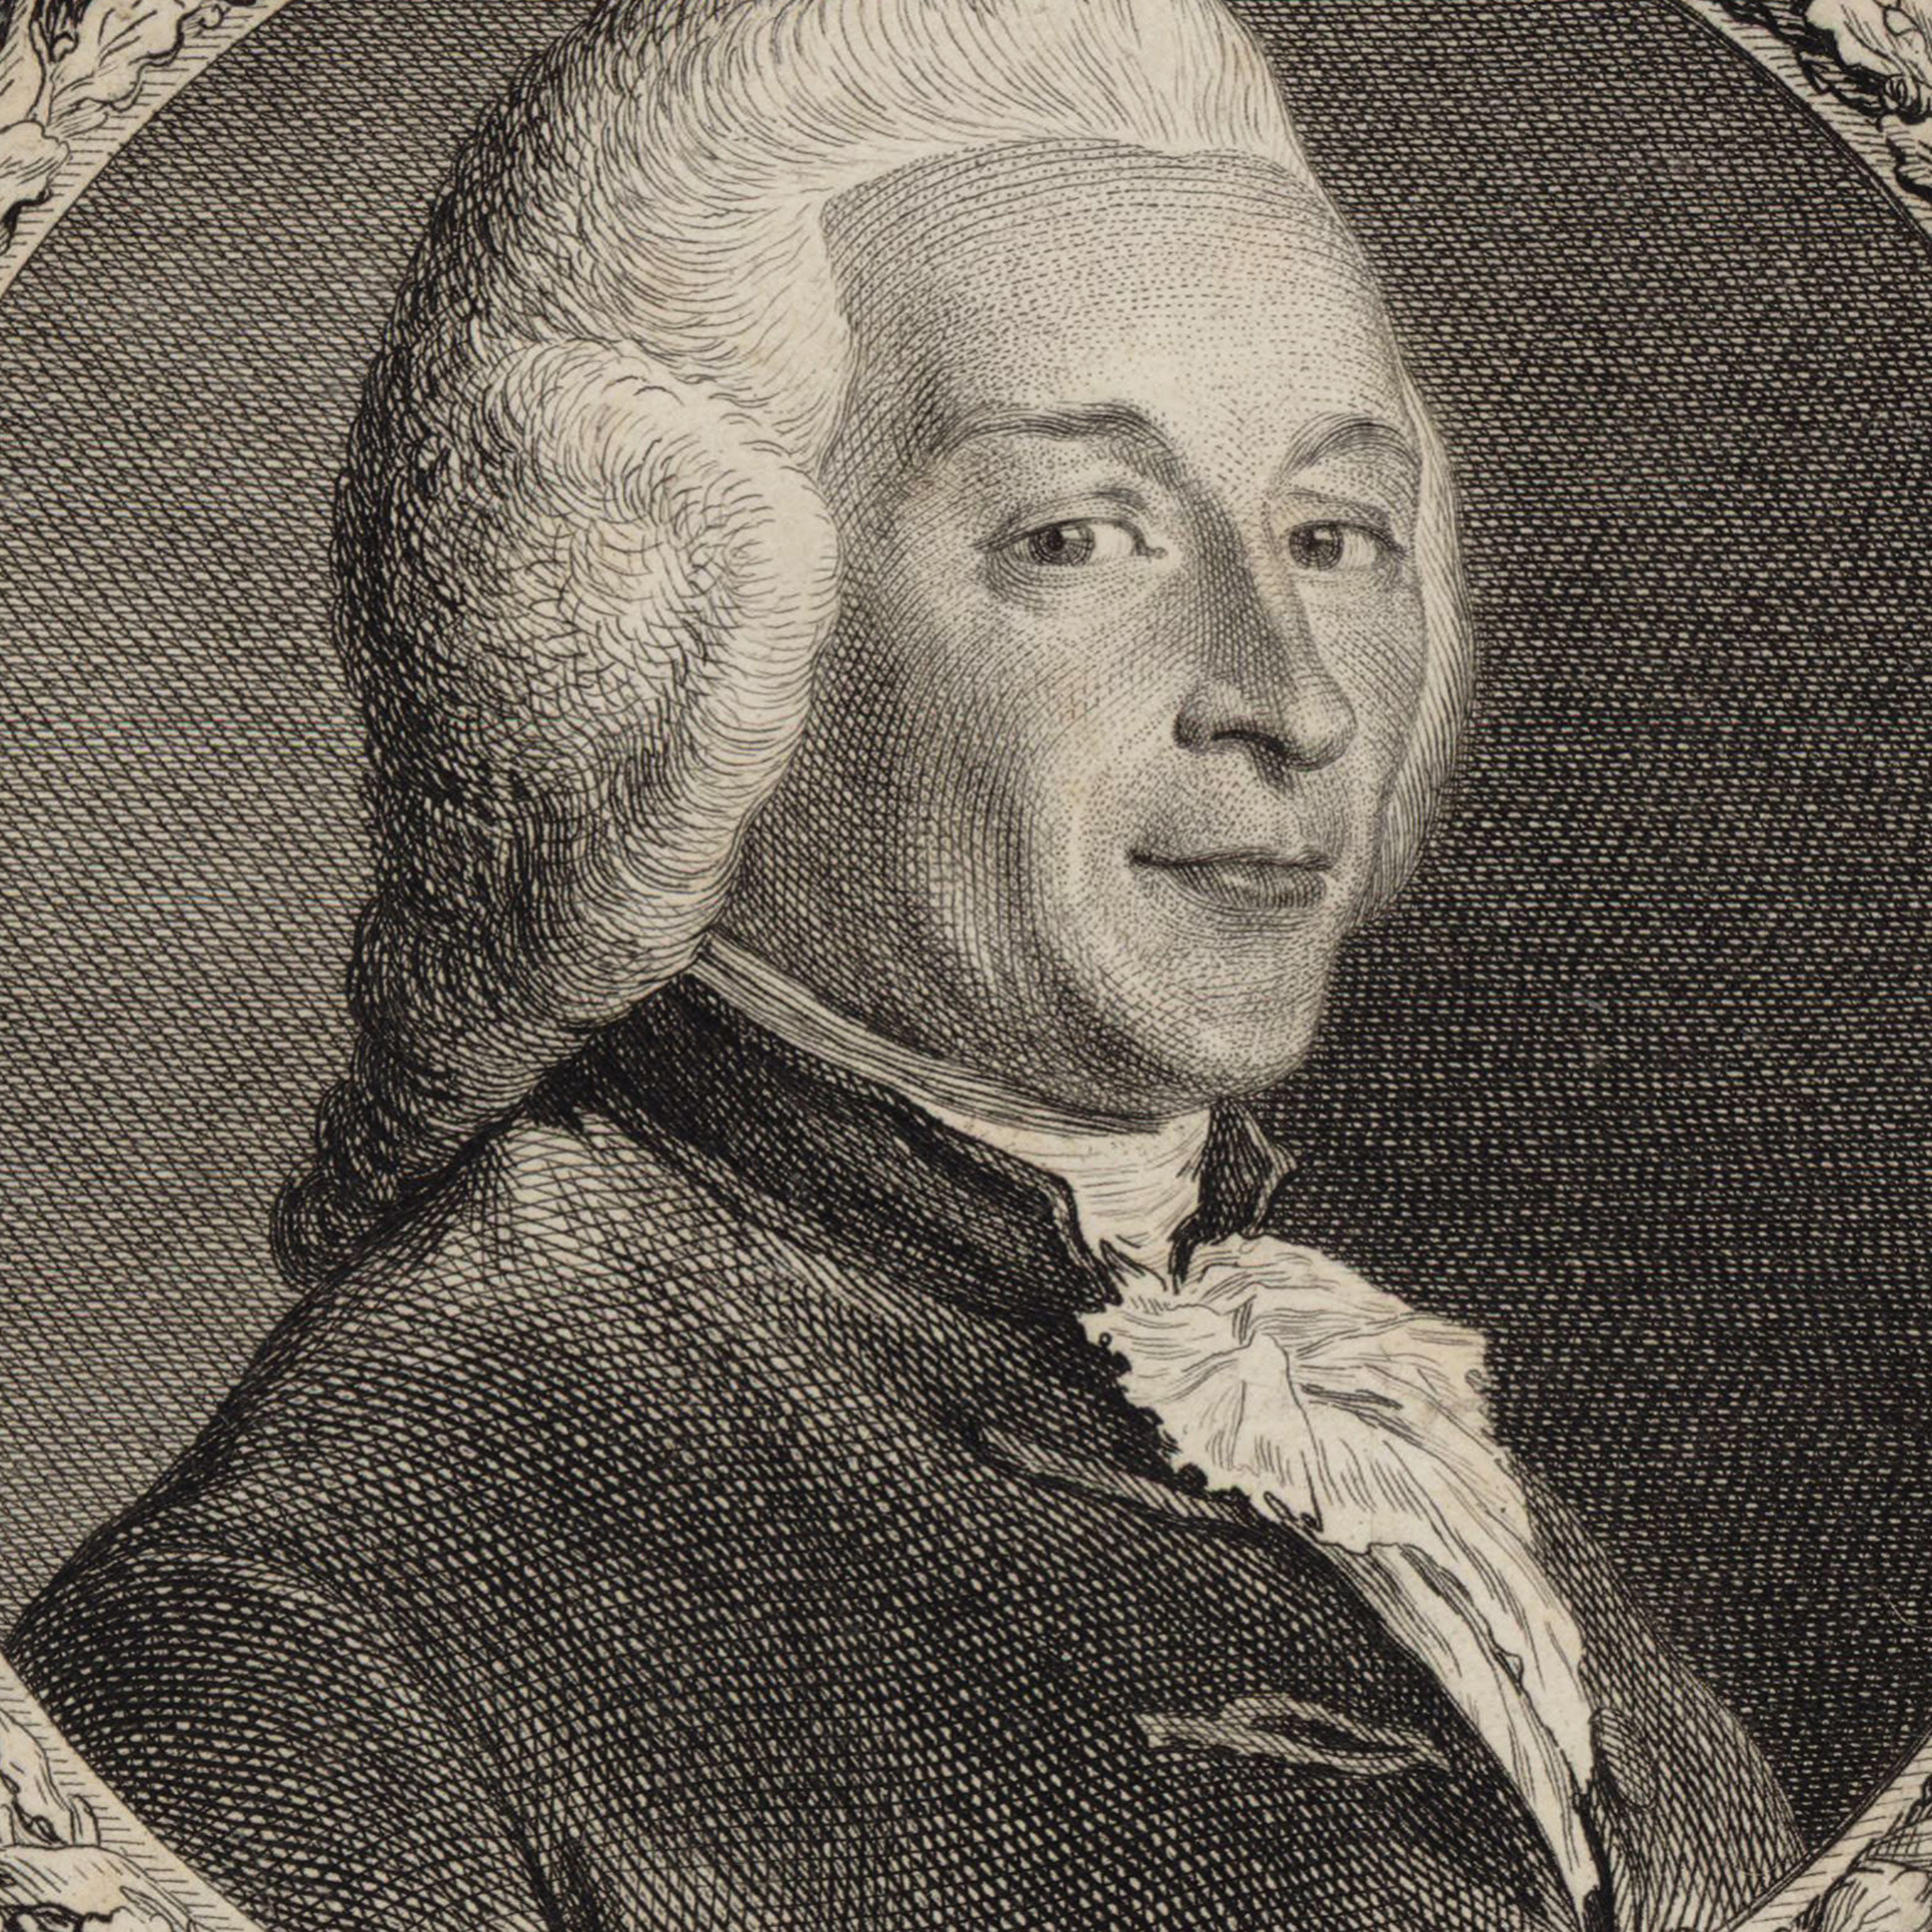 Portrait Of Joseph-Ignace Guillotin 1738-1814